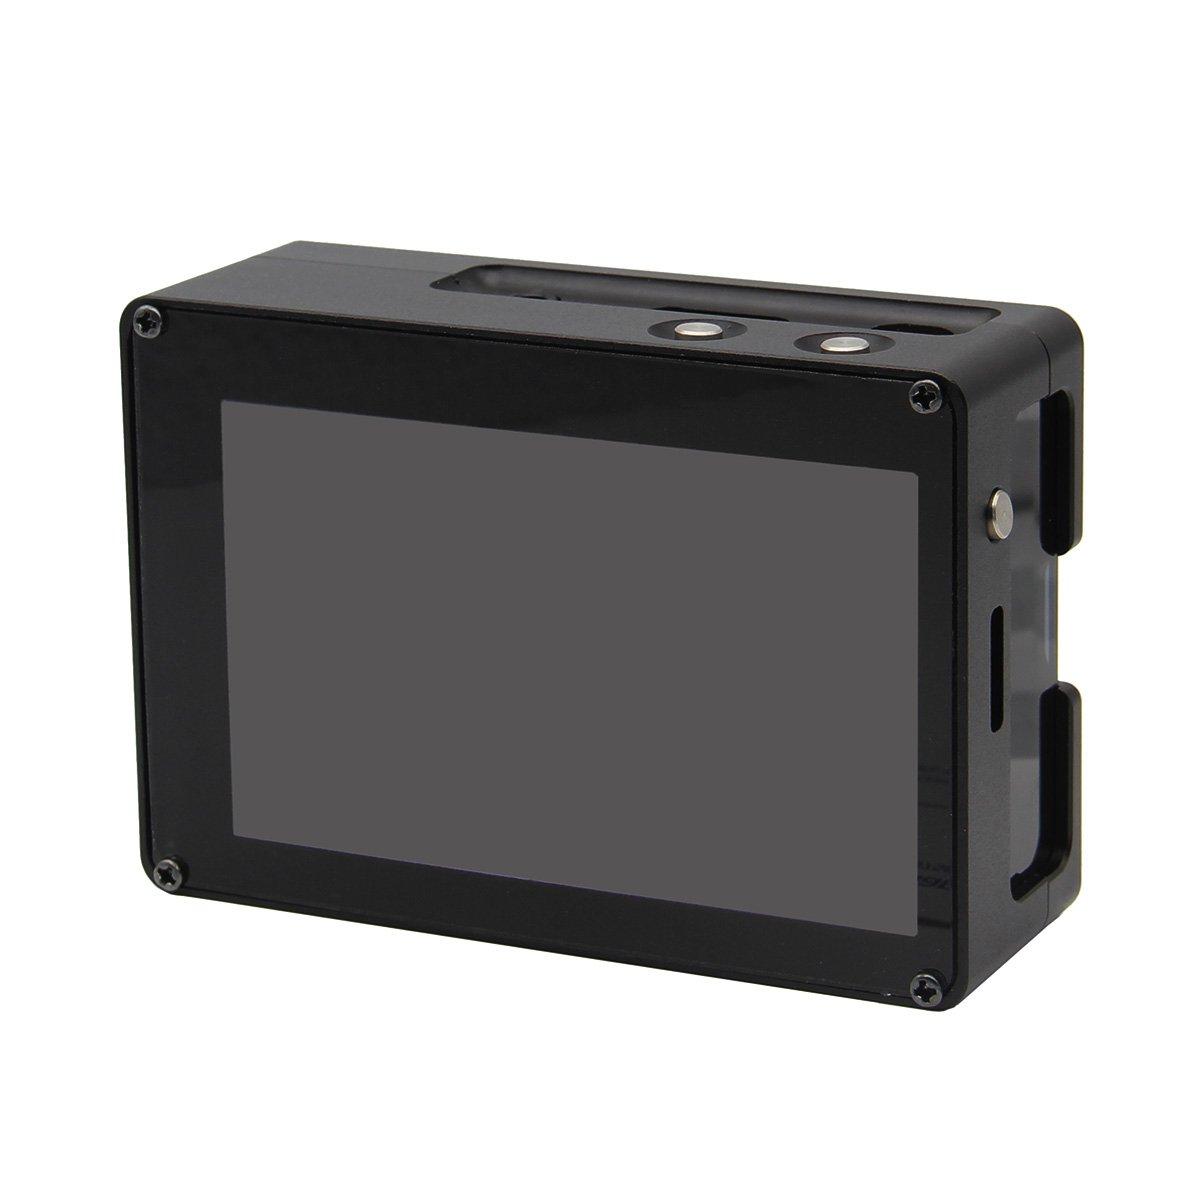 60+ Fps 800x480 High Resolution iUniker(TM) 3 5 inch Raspberry Pi